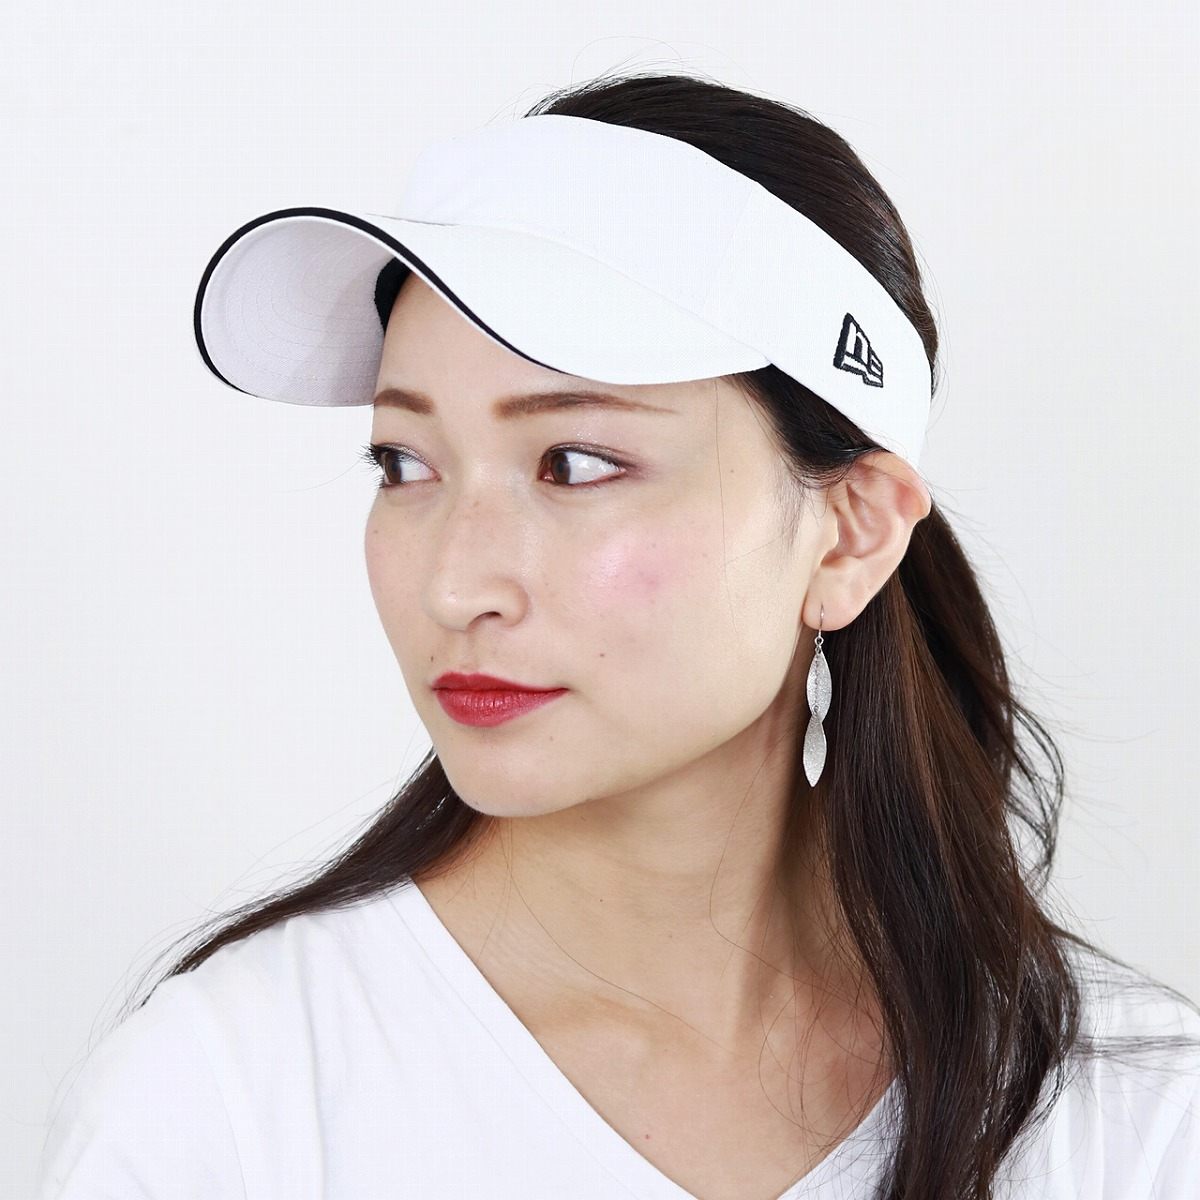 e1d07b2e ELEHELM HAT STORE: Sports new gills sun visor men UV measures NEWERA oar  season hat Lady's sun visor Lady's walk / white white | Rakuten Global  Market